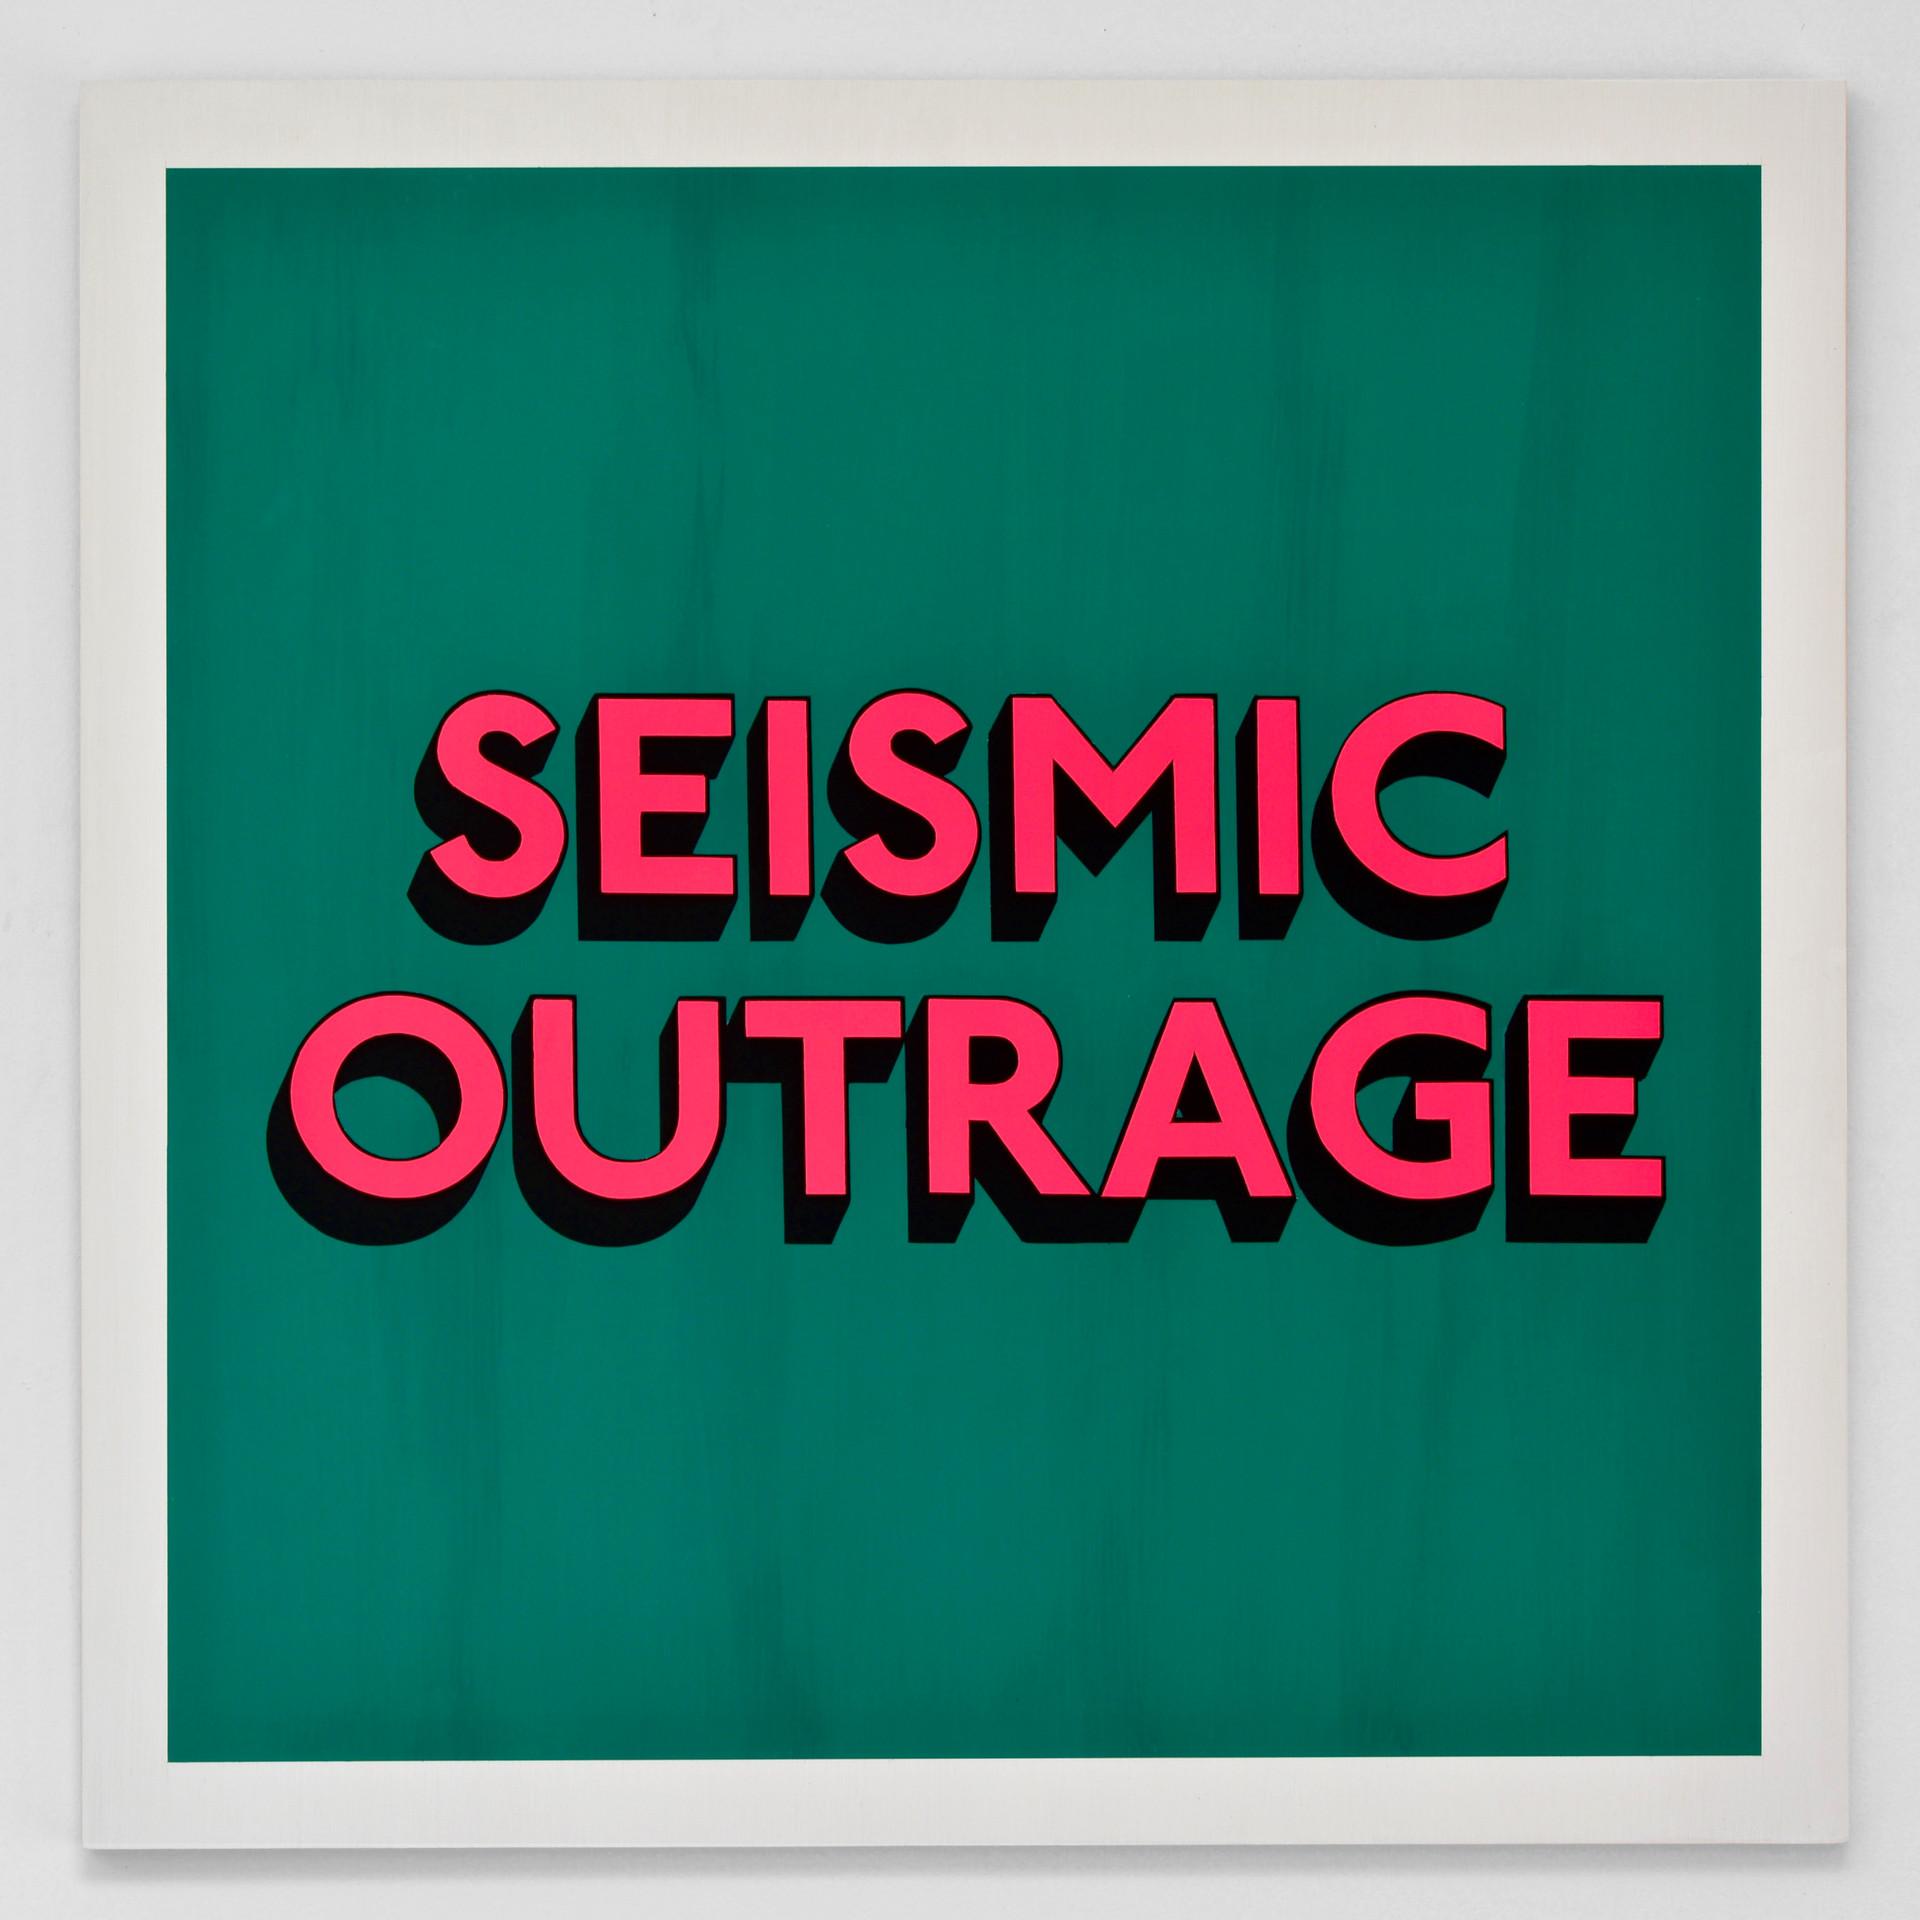 SEISMIC_OUTRAGE.jpg